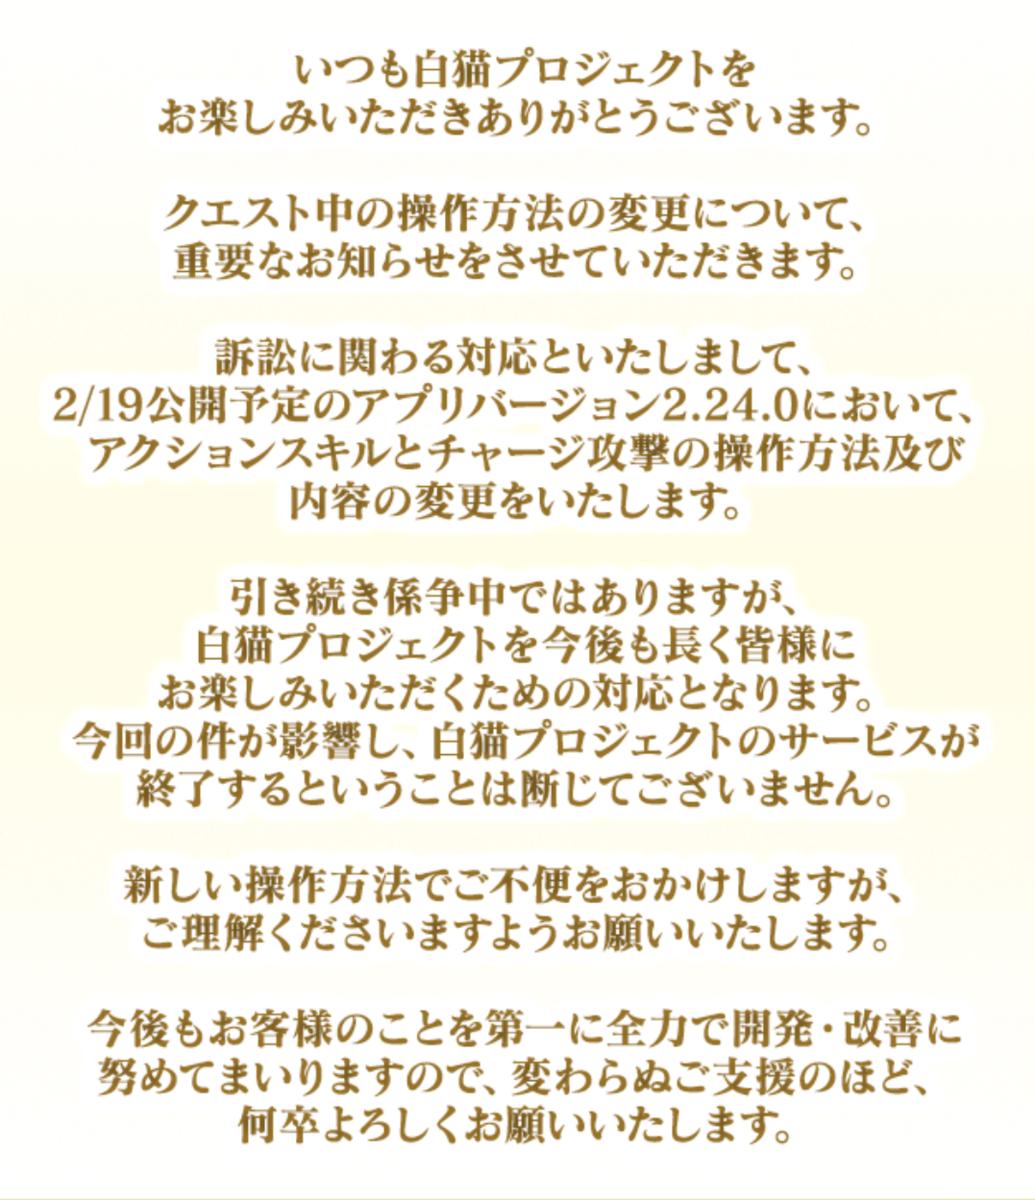 f:id:inoino_subcal:20200218162856p:plain